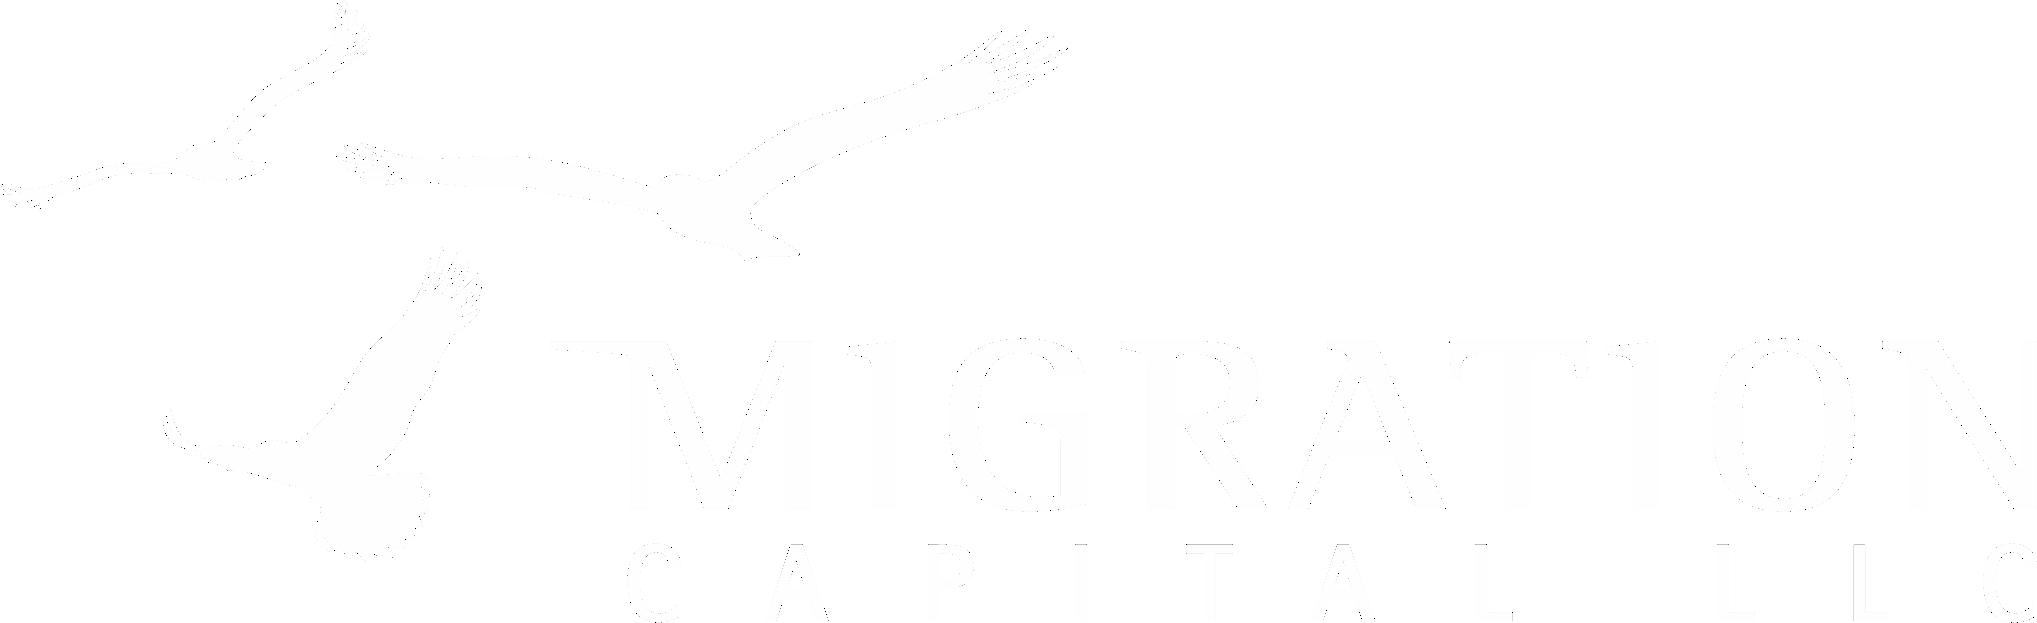 Migration Capital